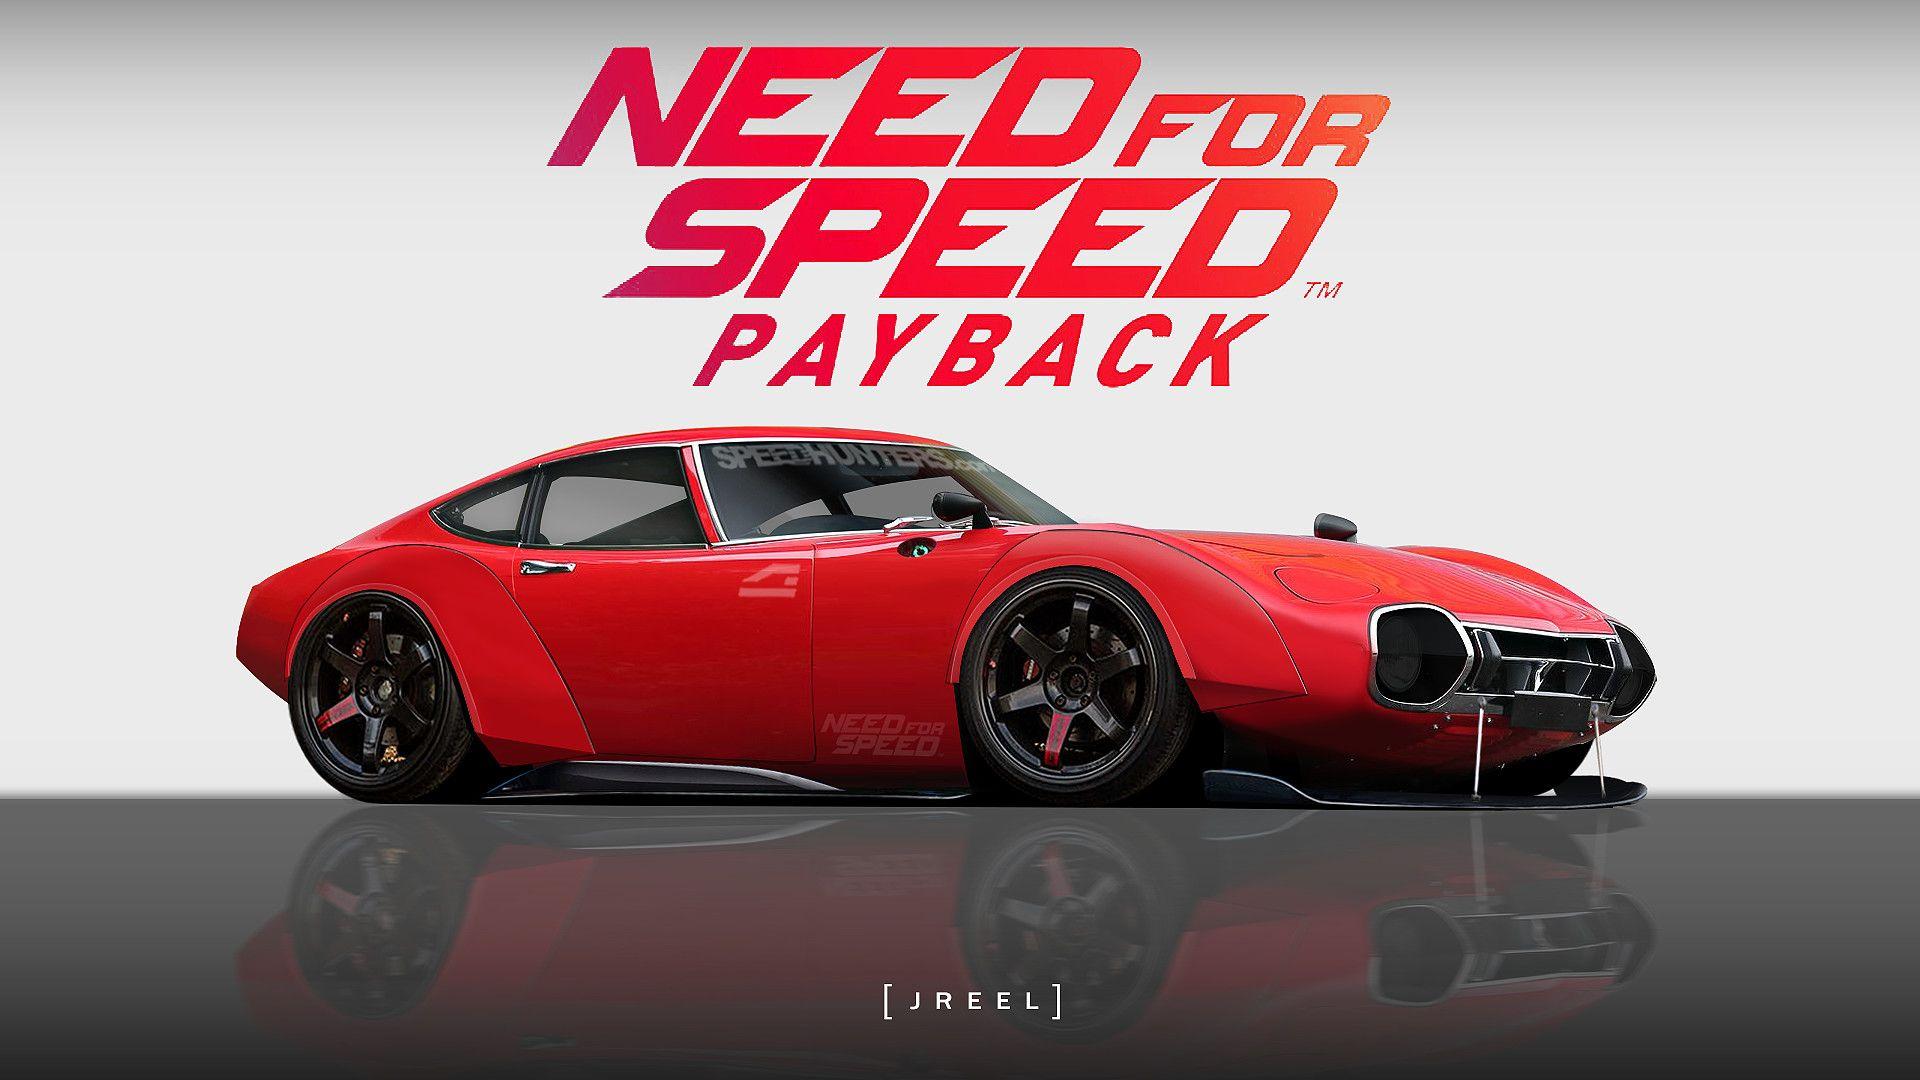 Chomikuj 1 Nfs Payback Nfs Payback Pl Wymagania Zapraszam Na Nasze Profile Need For Speed Payback Fans Oficjalna Strona Http Needfor Need For Speed